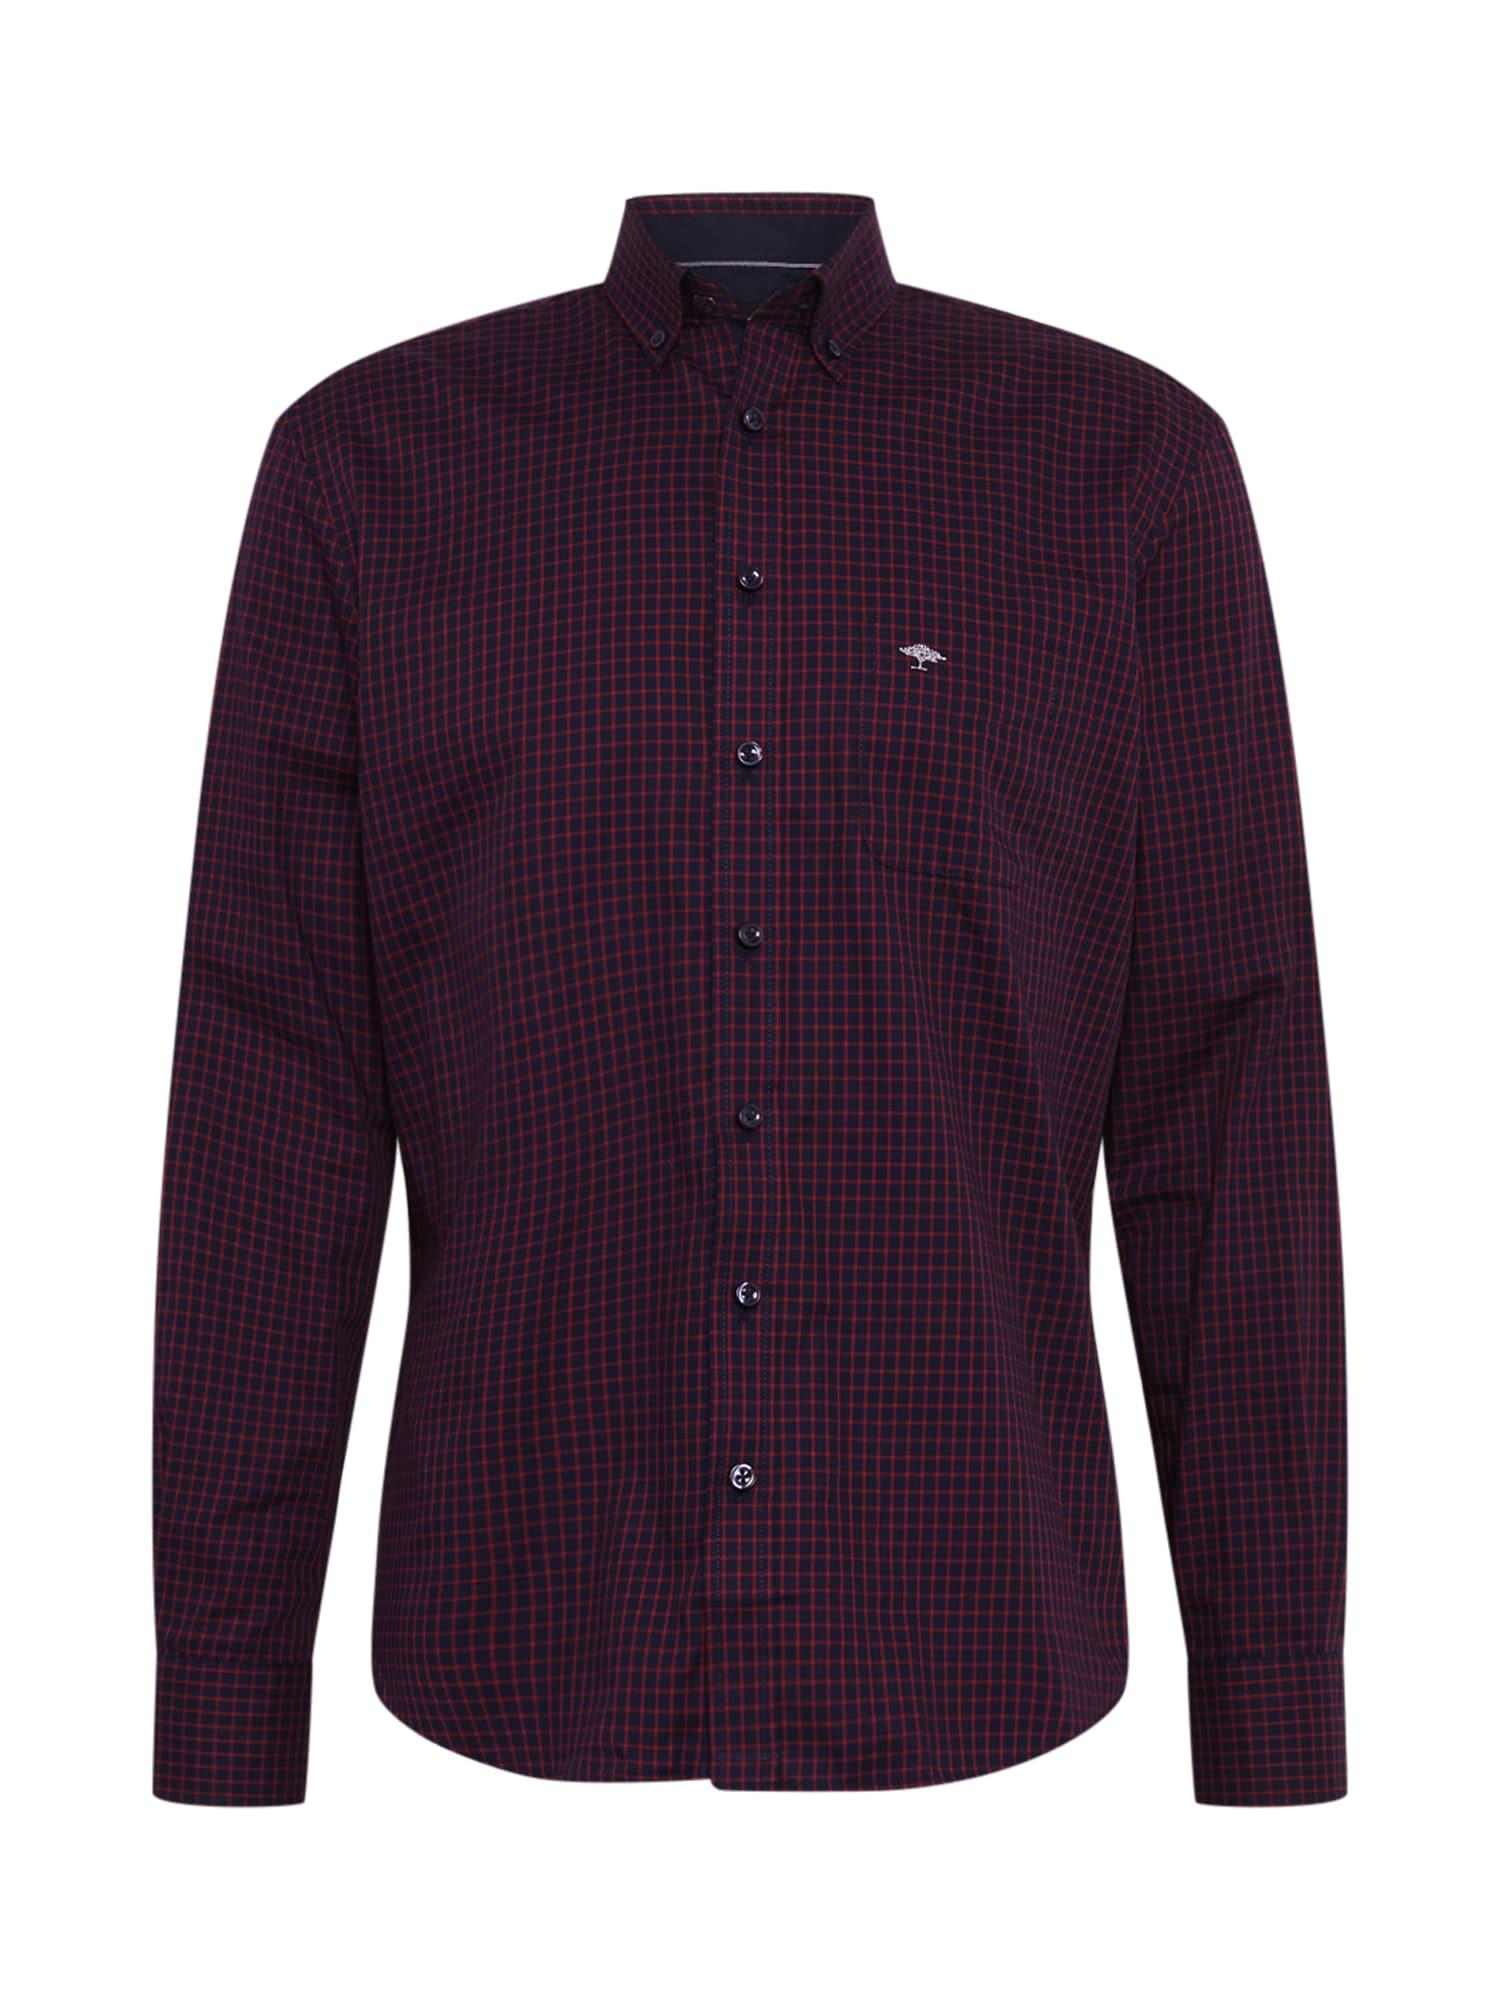 FYNCH-HATTON Marškiniai raudona / tamsiai mėlyna